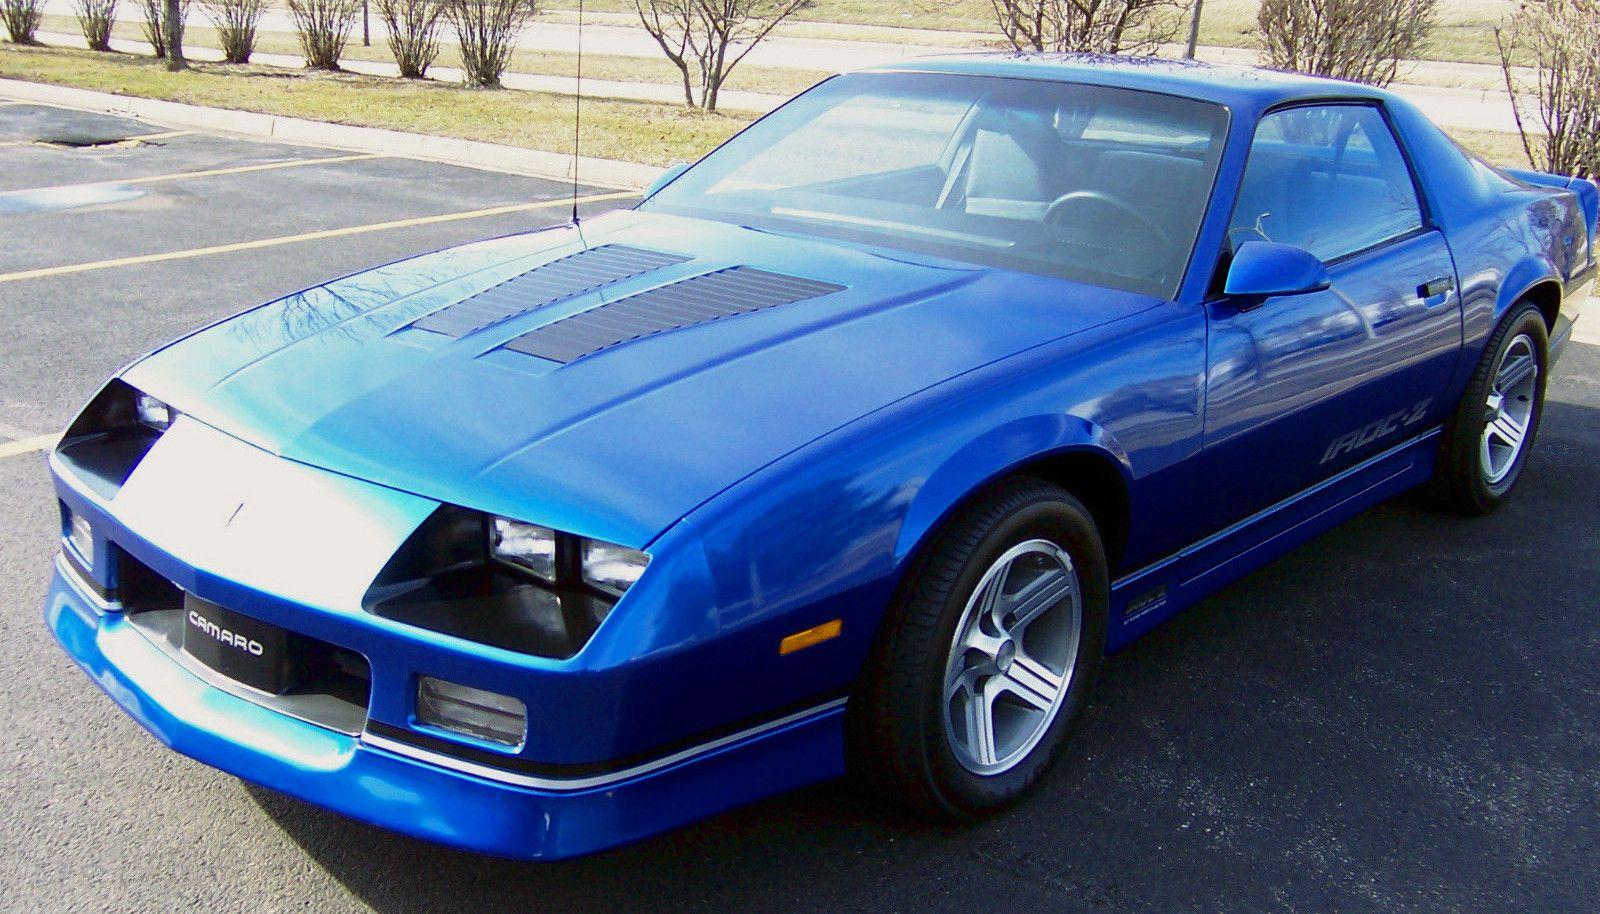 "<img src=""2020-camaro-irocz.jpg"" alt=""1985 Chevrolet Camaro IROC-Z"">"